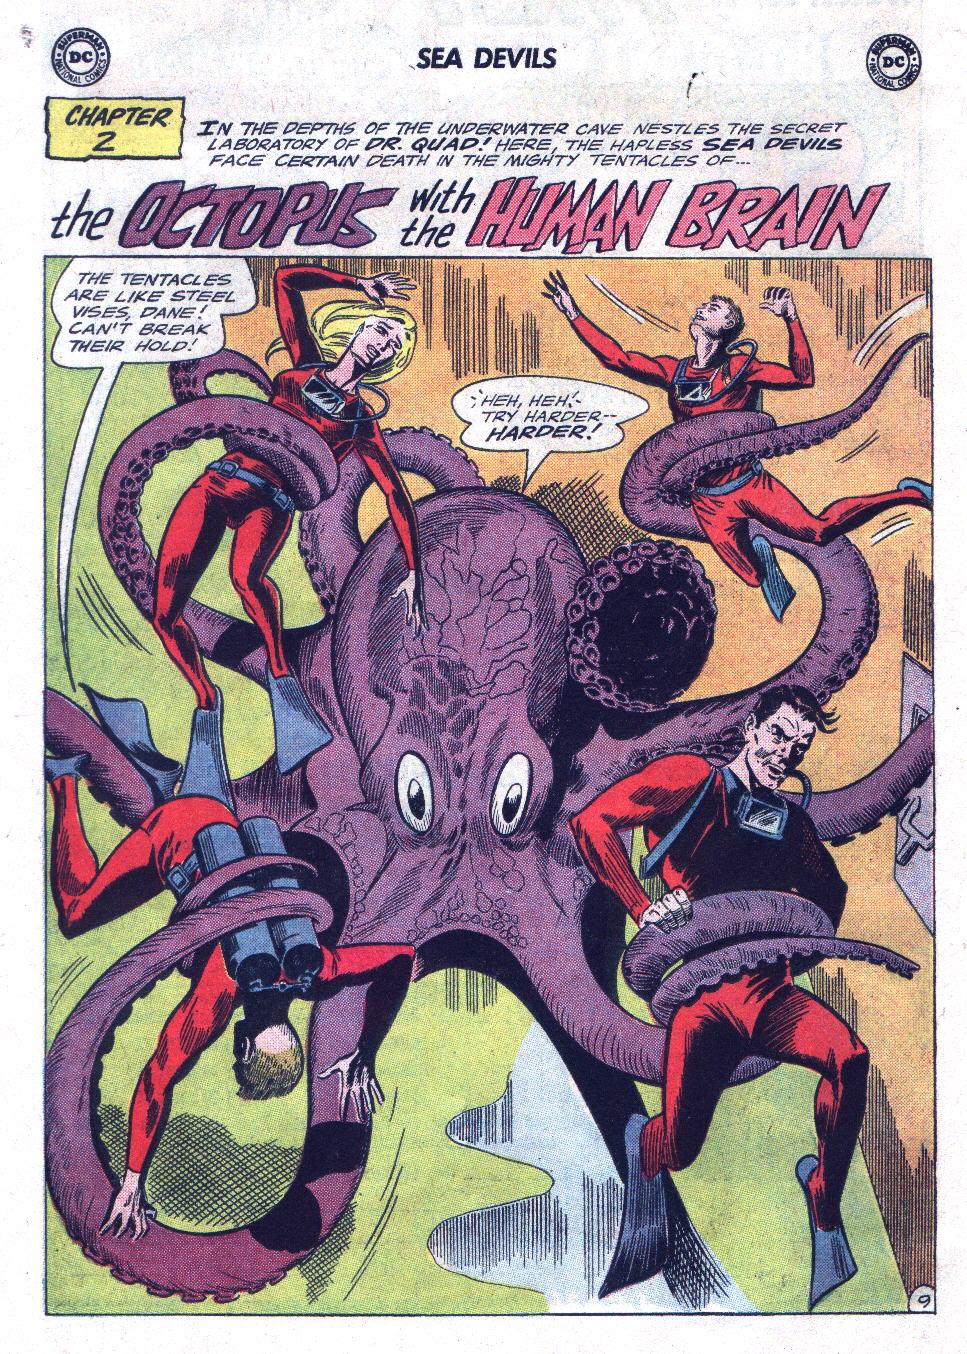 Read online Sea Devils comic -  Issue #21 - 14